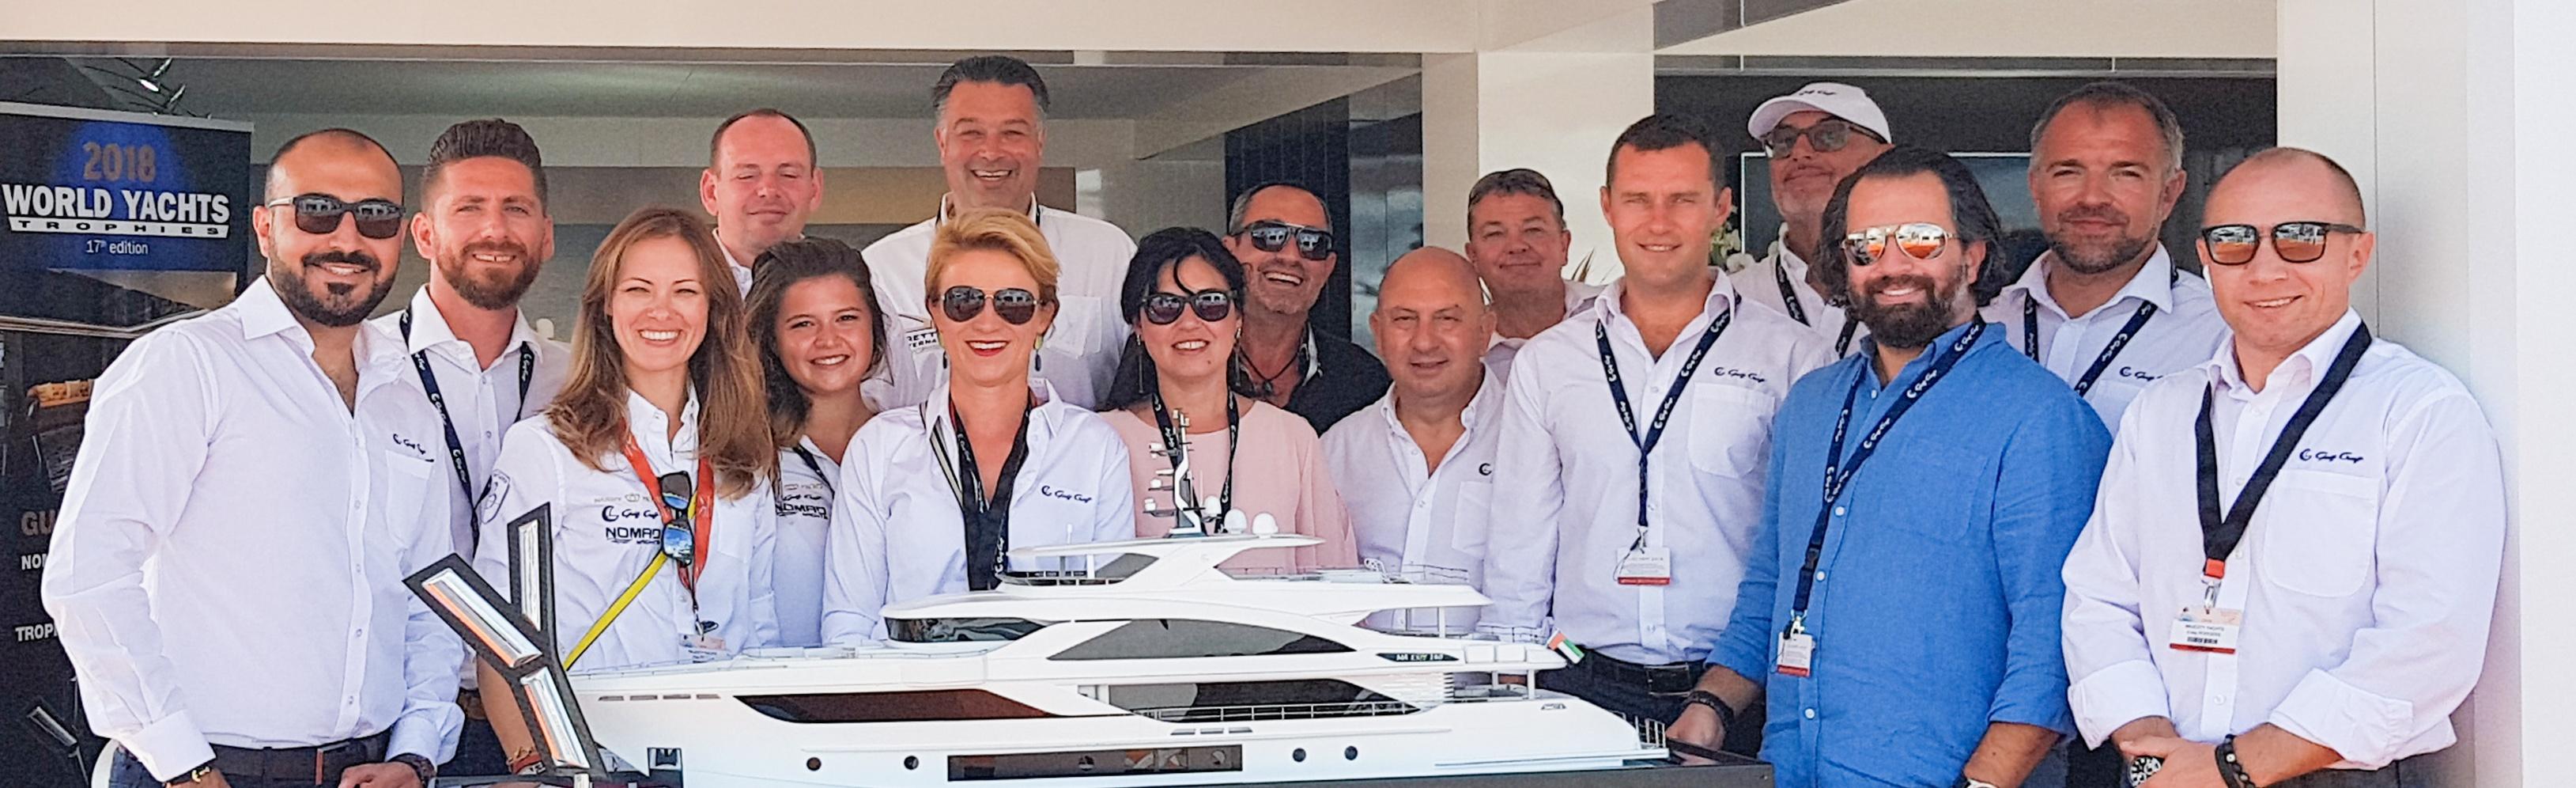 Gulf-Craft-team,-Cannes-Yachting-Festival